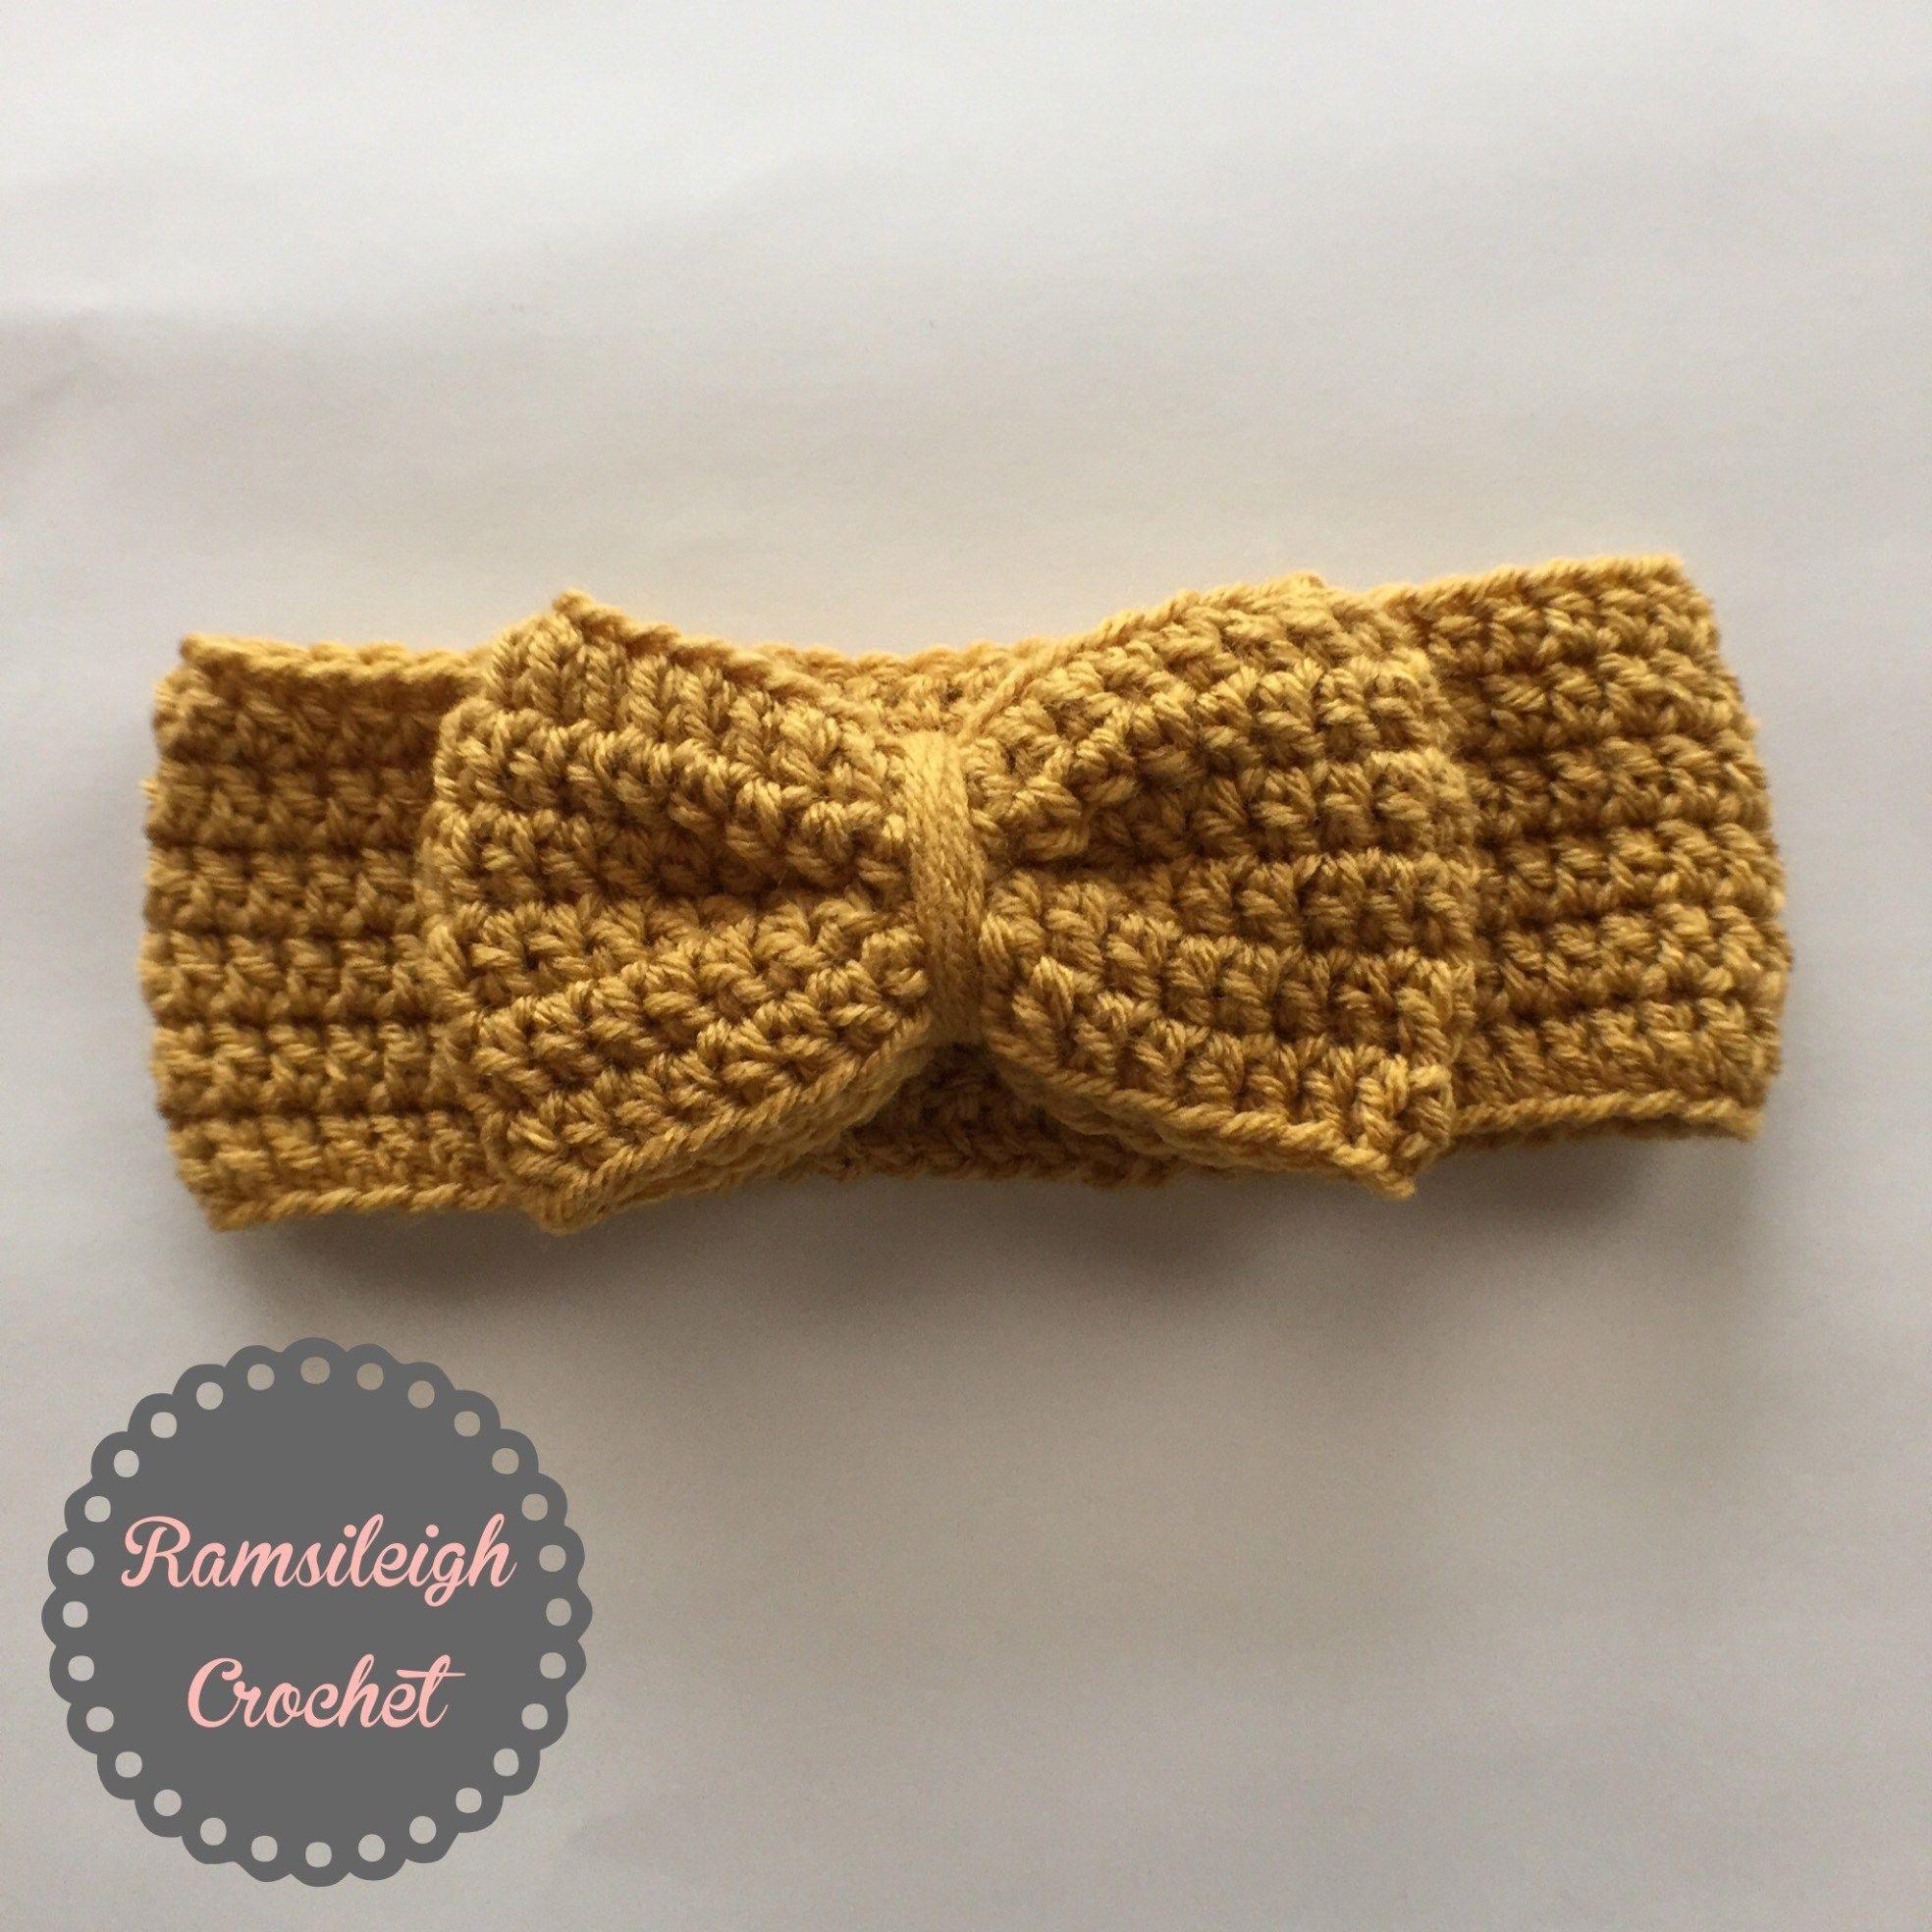 I Like Big Bows! Crochet Bow Headwrap {FREE PATTERN} | Ramsileigh Designs #crochetbowpattern